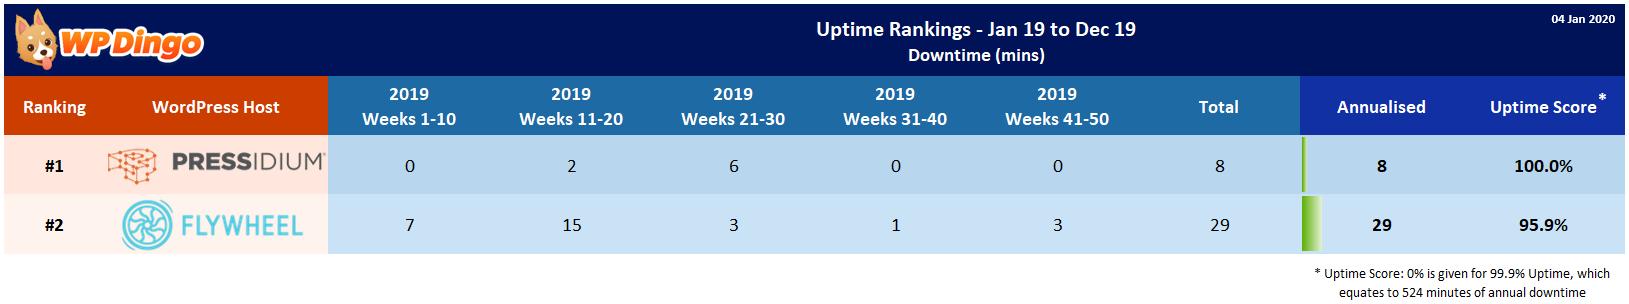 Flywheel vs Pressidium 2019 Uptime Test Results